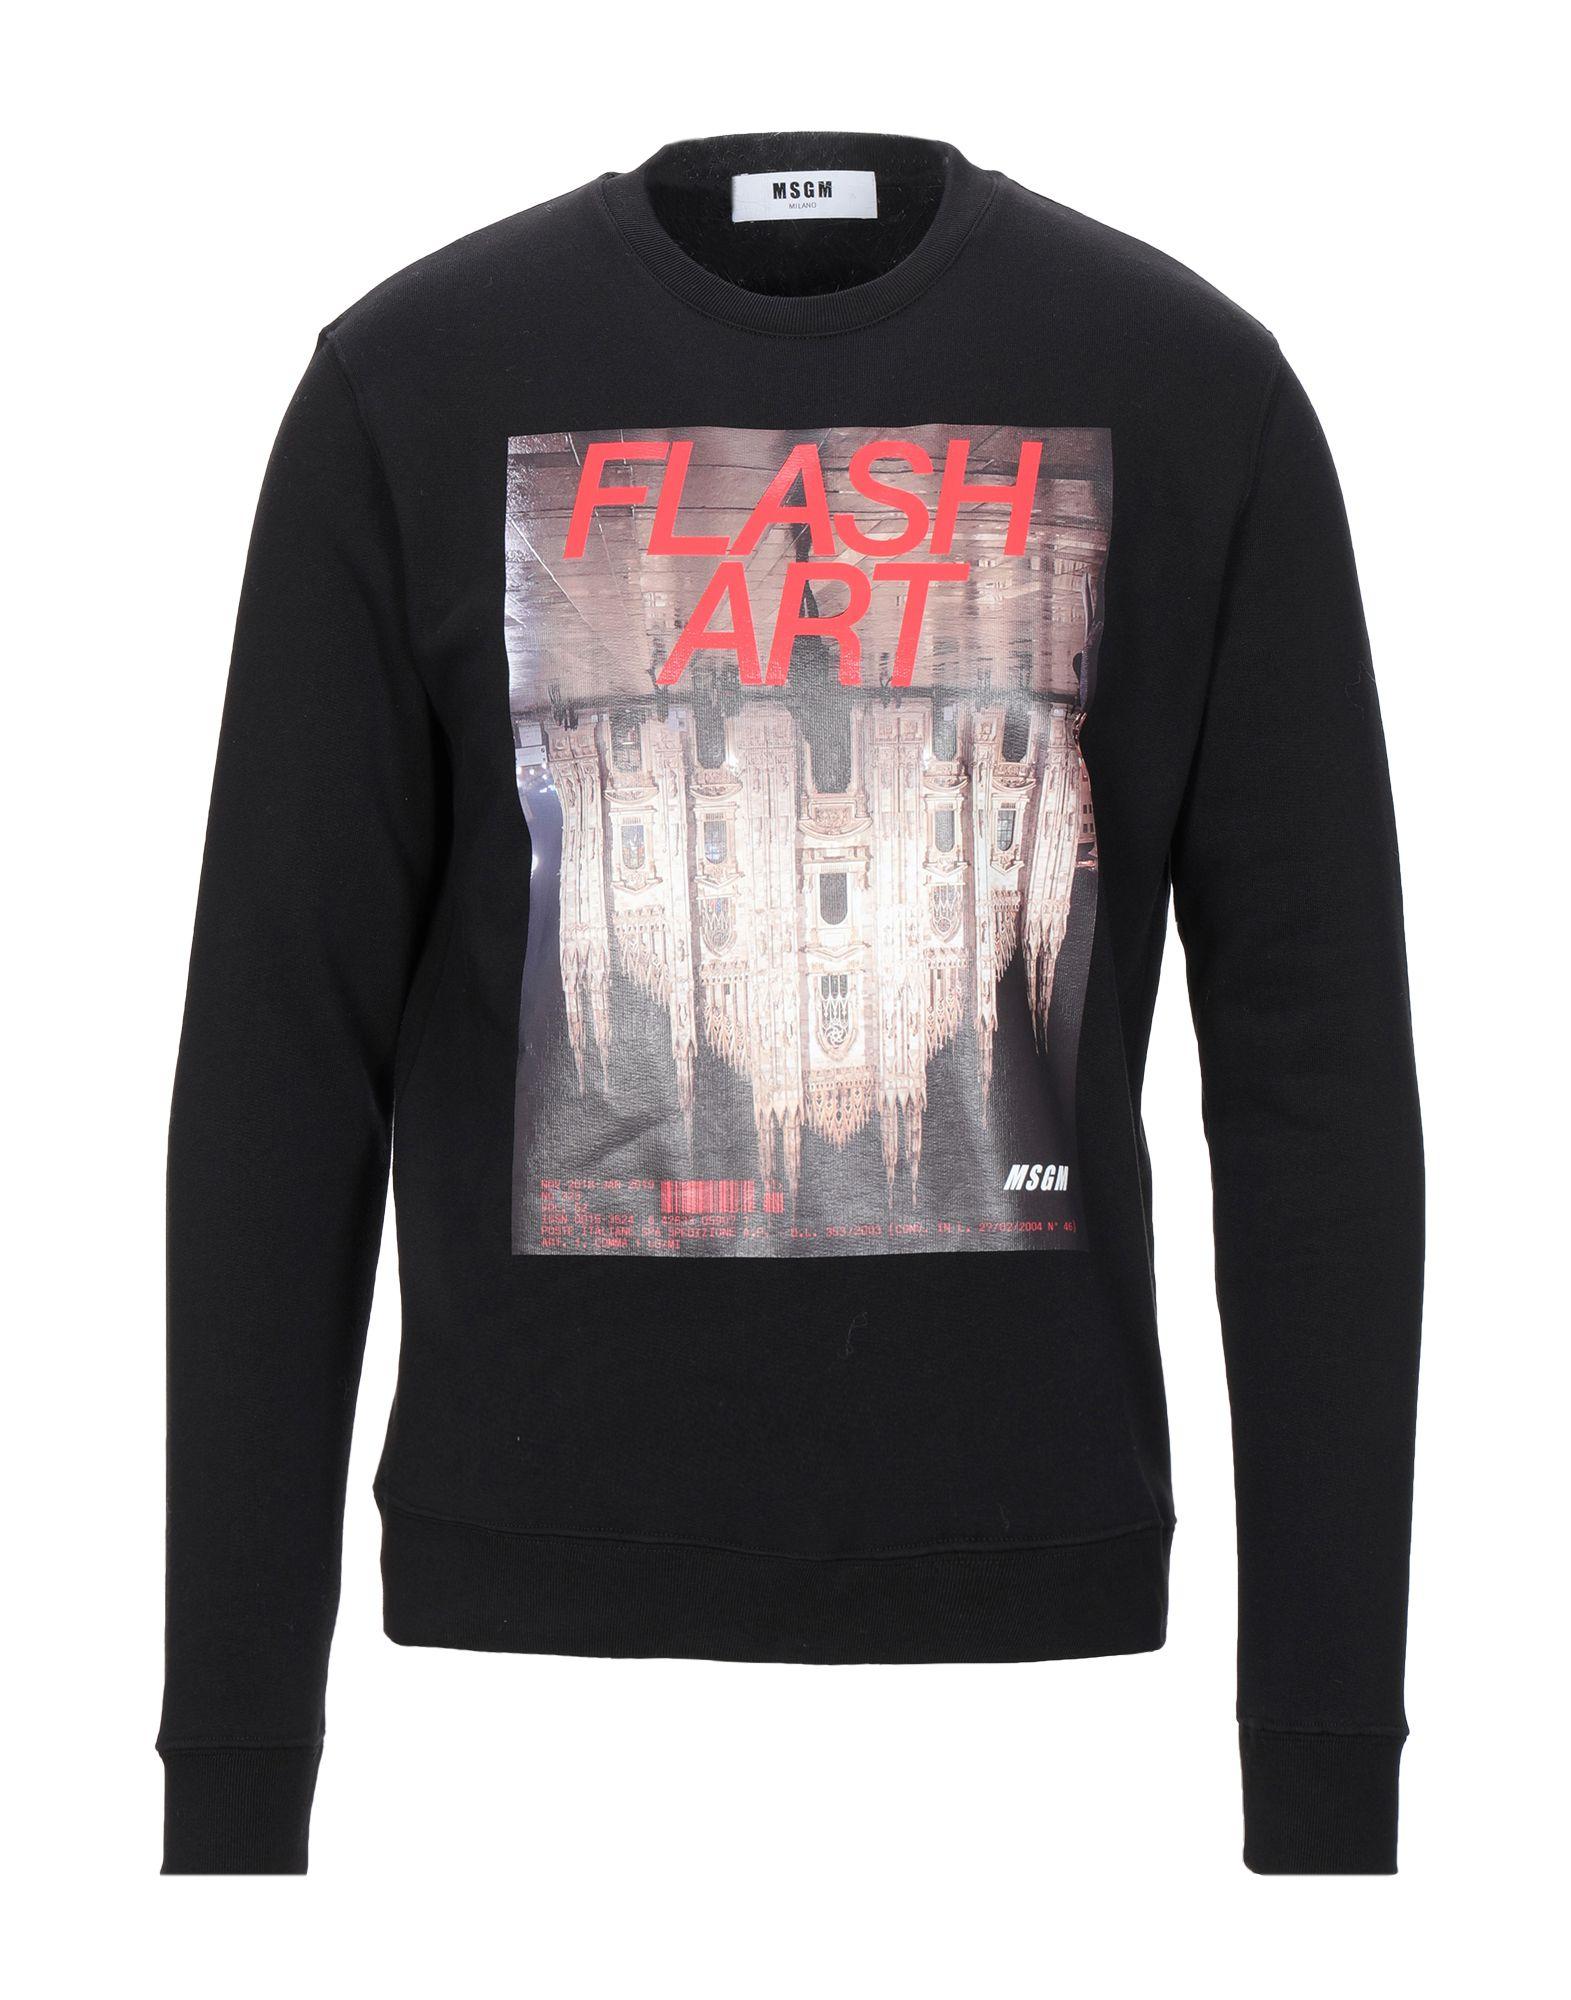 sweatshirt fleece, print, solid color, round collar, long sleeves, no pockets, fleece lining, large